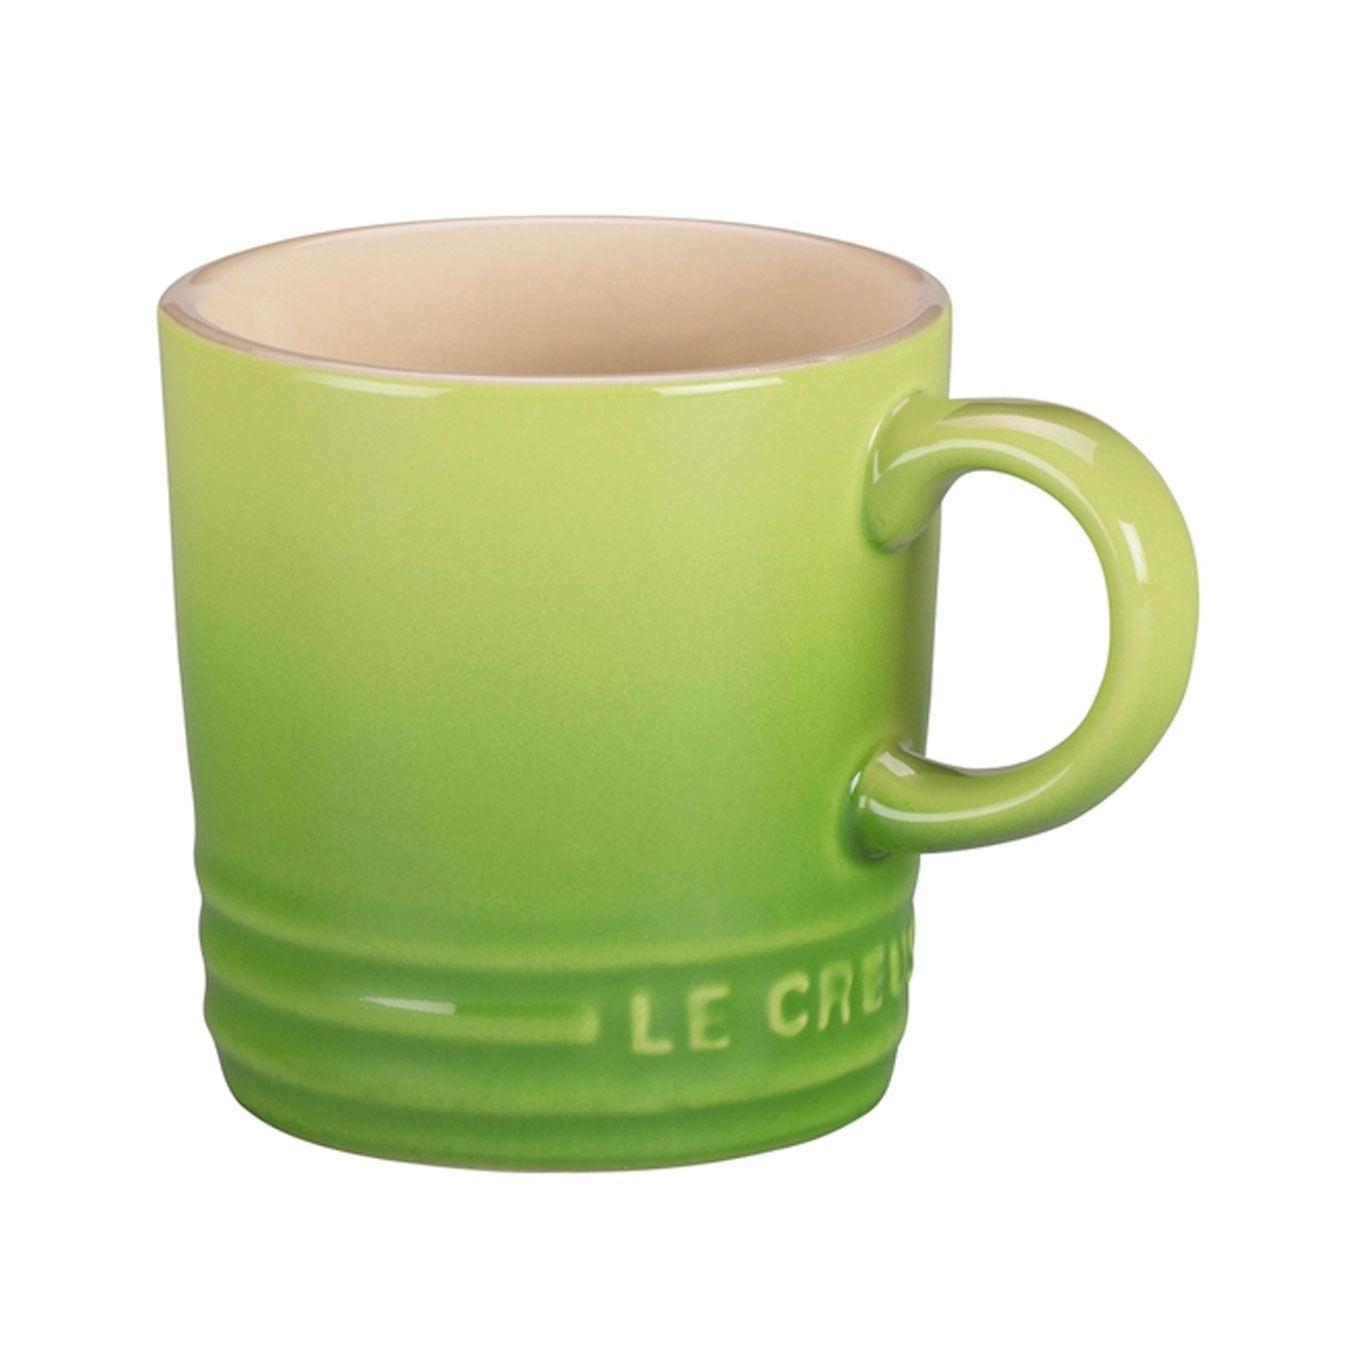 Caneca Cappuccino Verde Palm Le Creuset